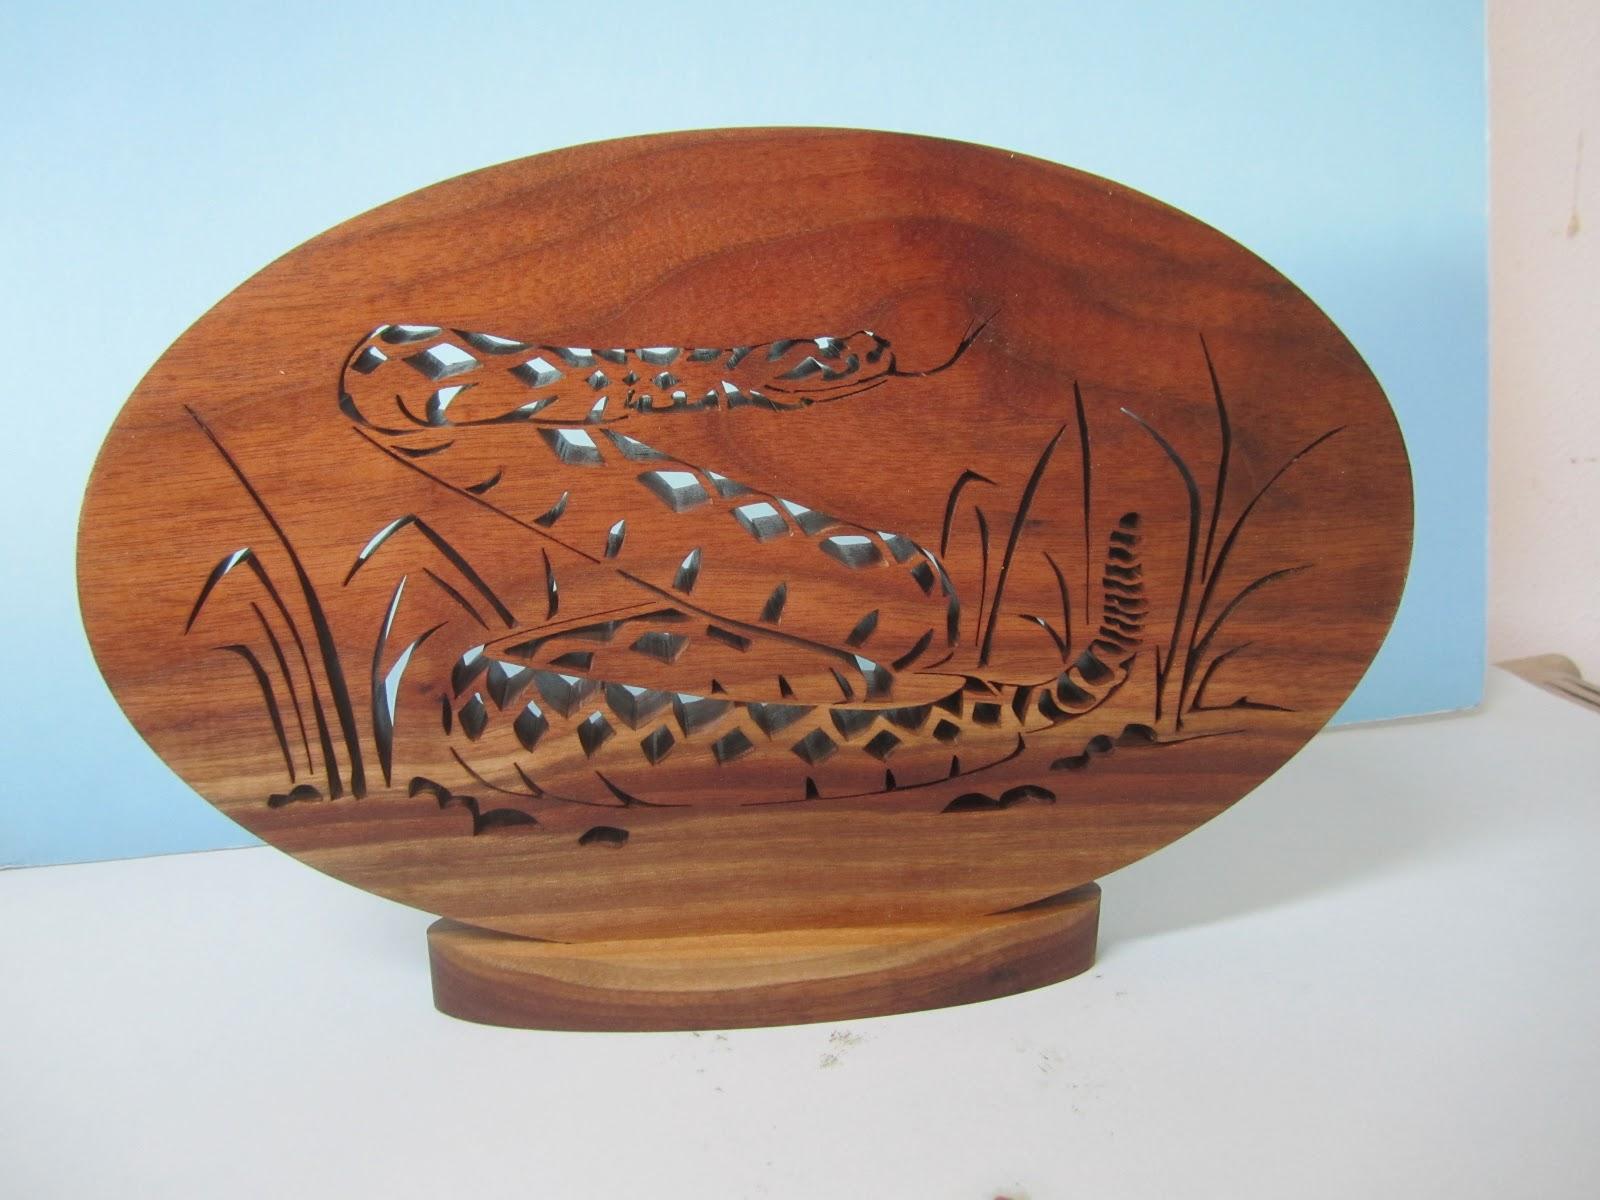 Diamondback Rattlesnake Black walnut Jacob Fowler Creative woodworks September 2009